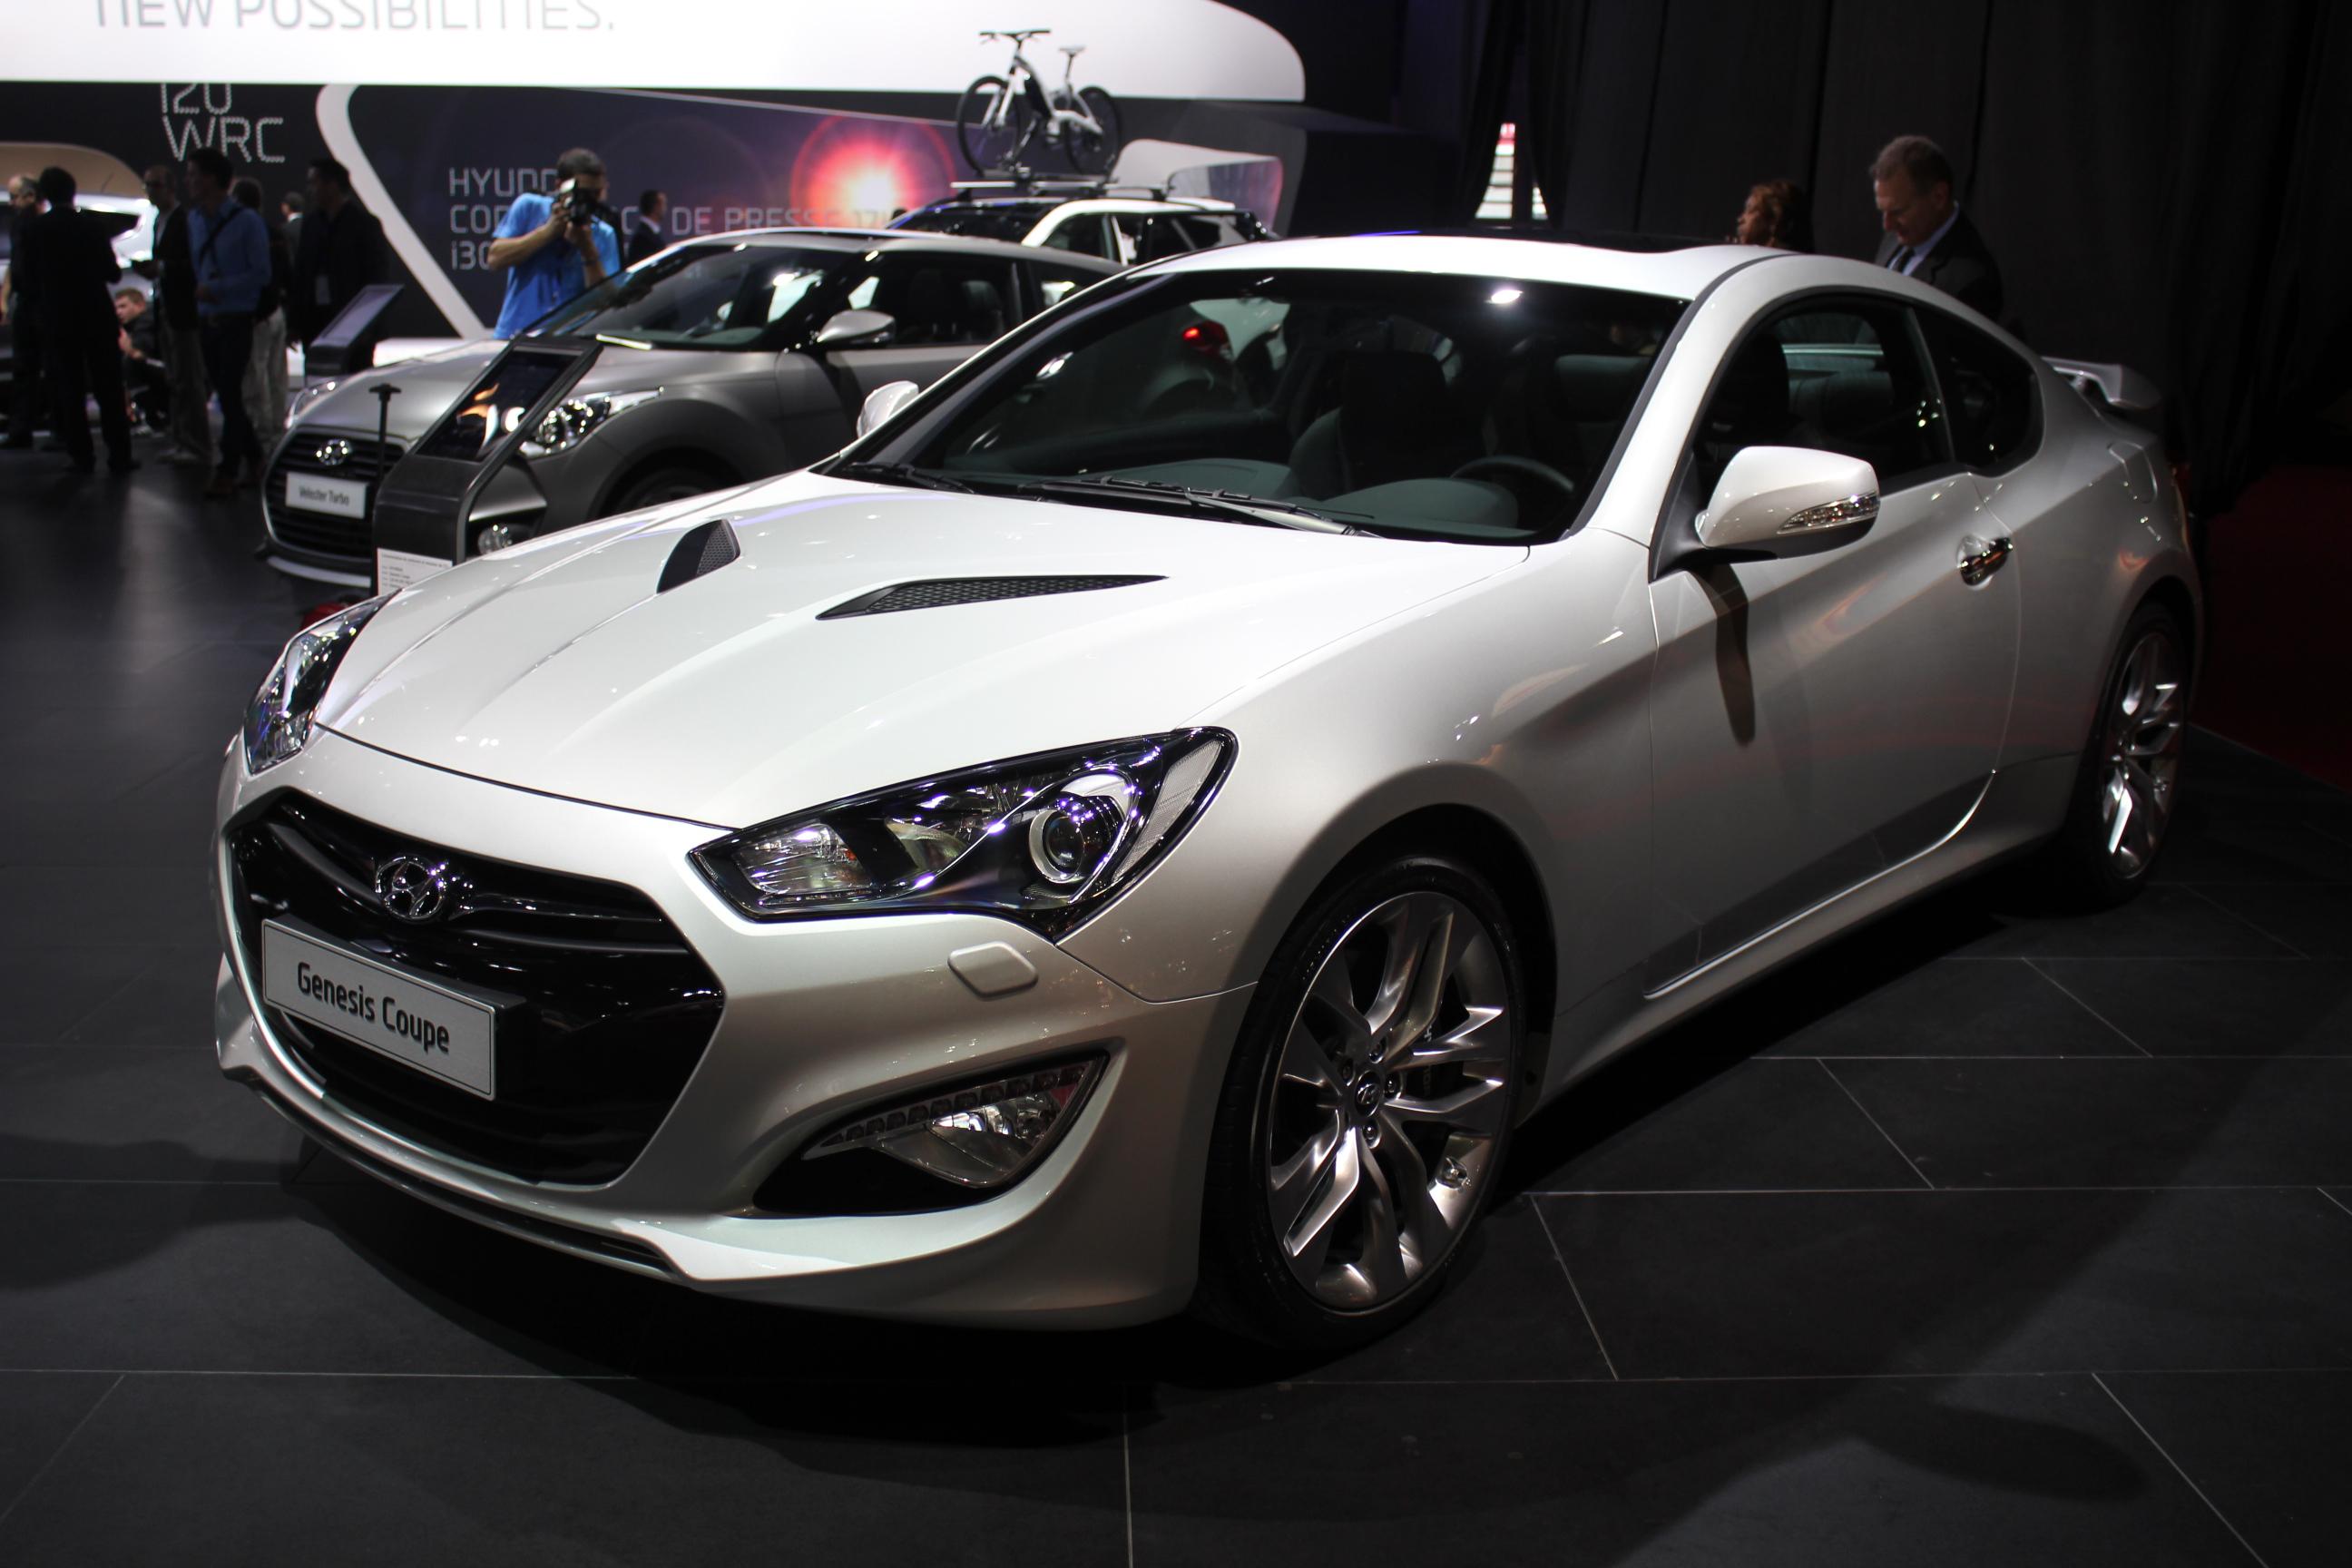 http://images.caradisiac.com/images/1/3/7/1/81371/S0-En-direct-du-Mondial-2012-Hyundai-Genesis-Coupe-restyle-l-injustement-boude-273872.jpg